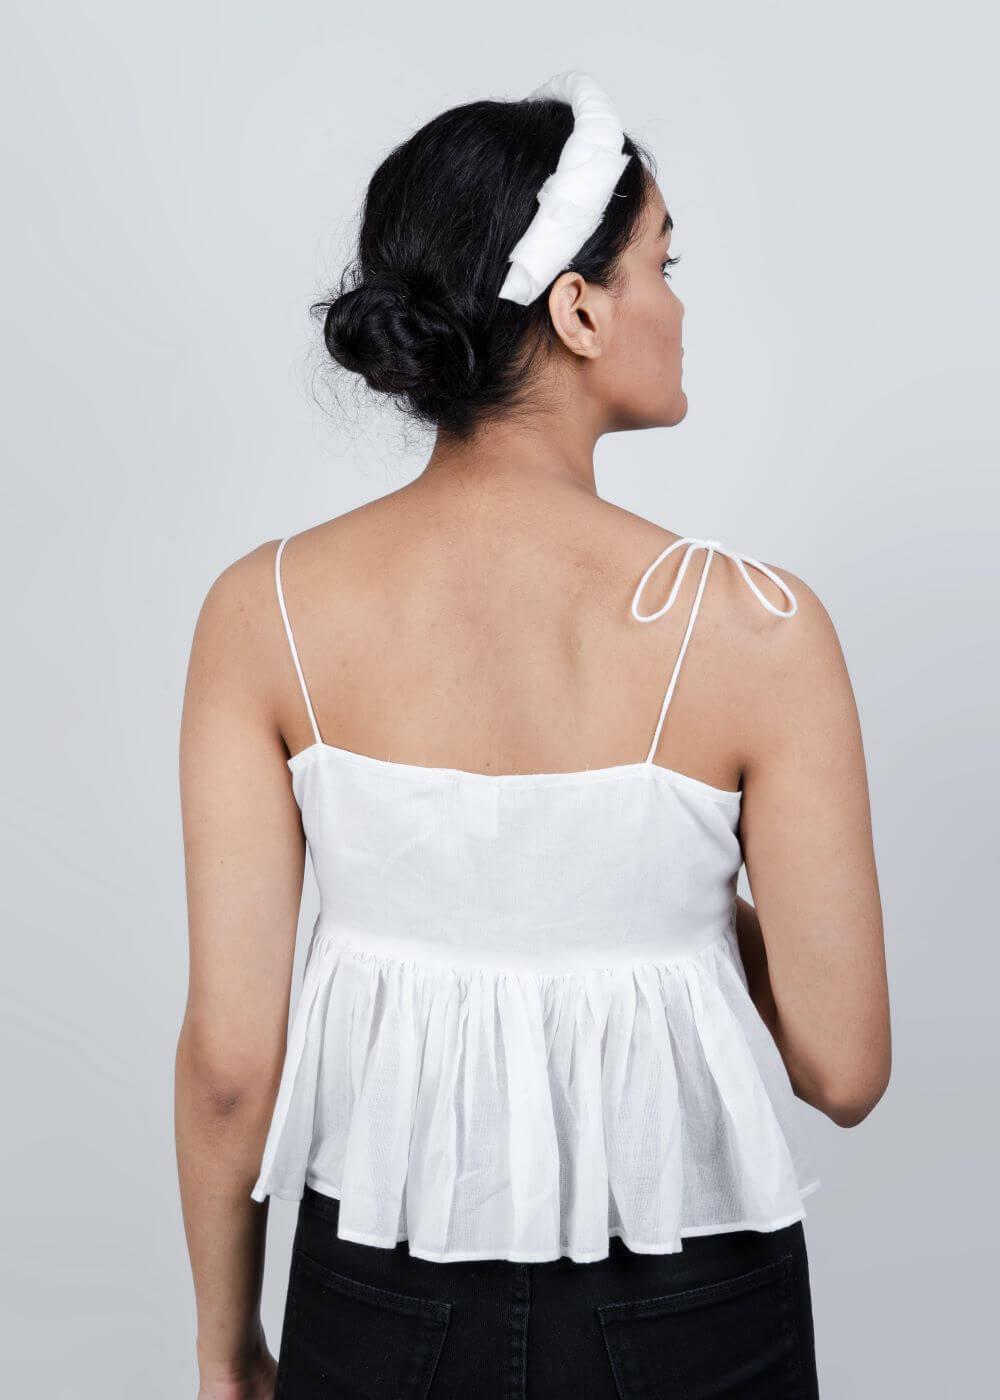 STOREAT44 | Best Black & White Clothing Brand | 2